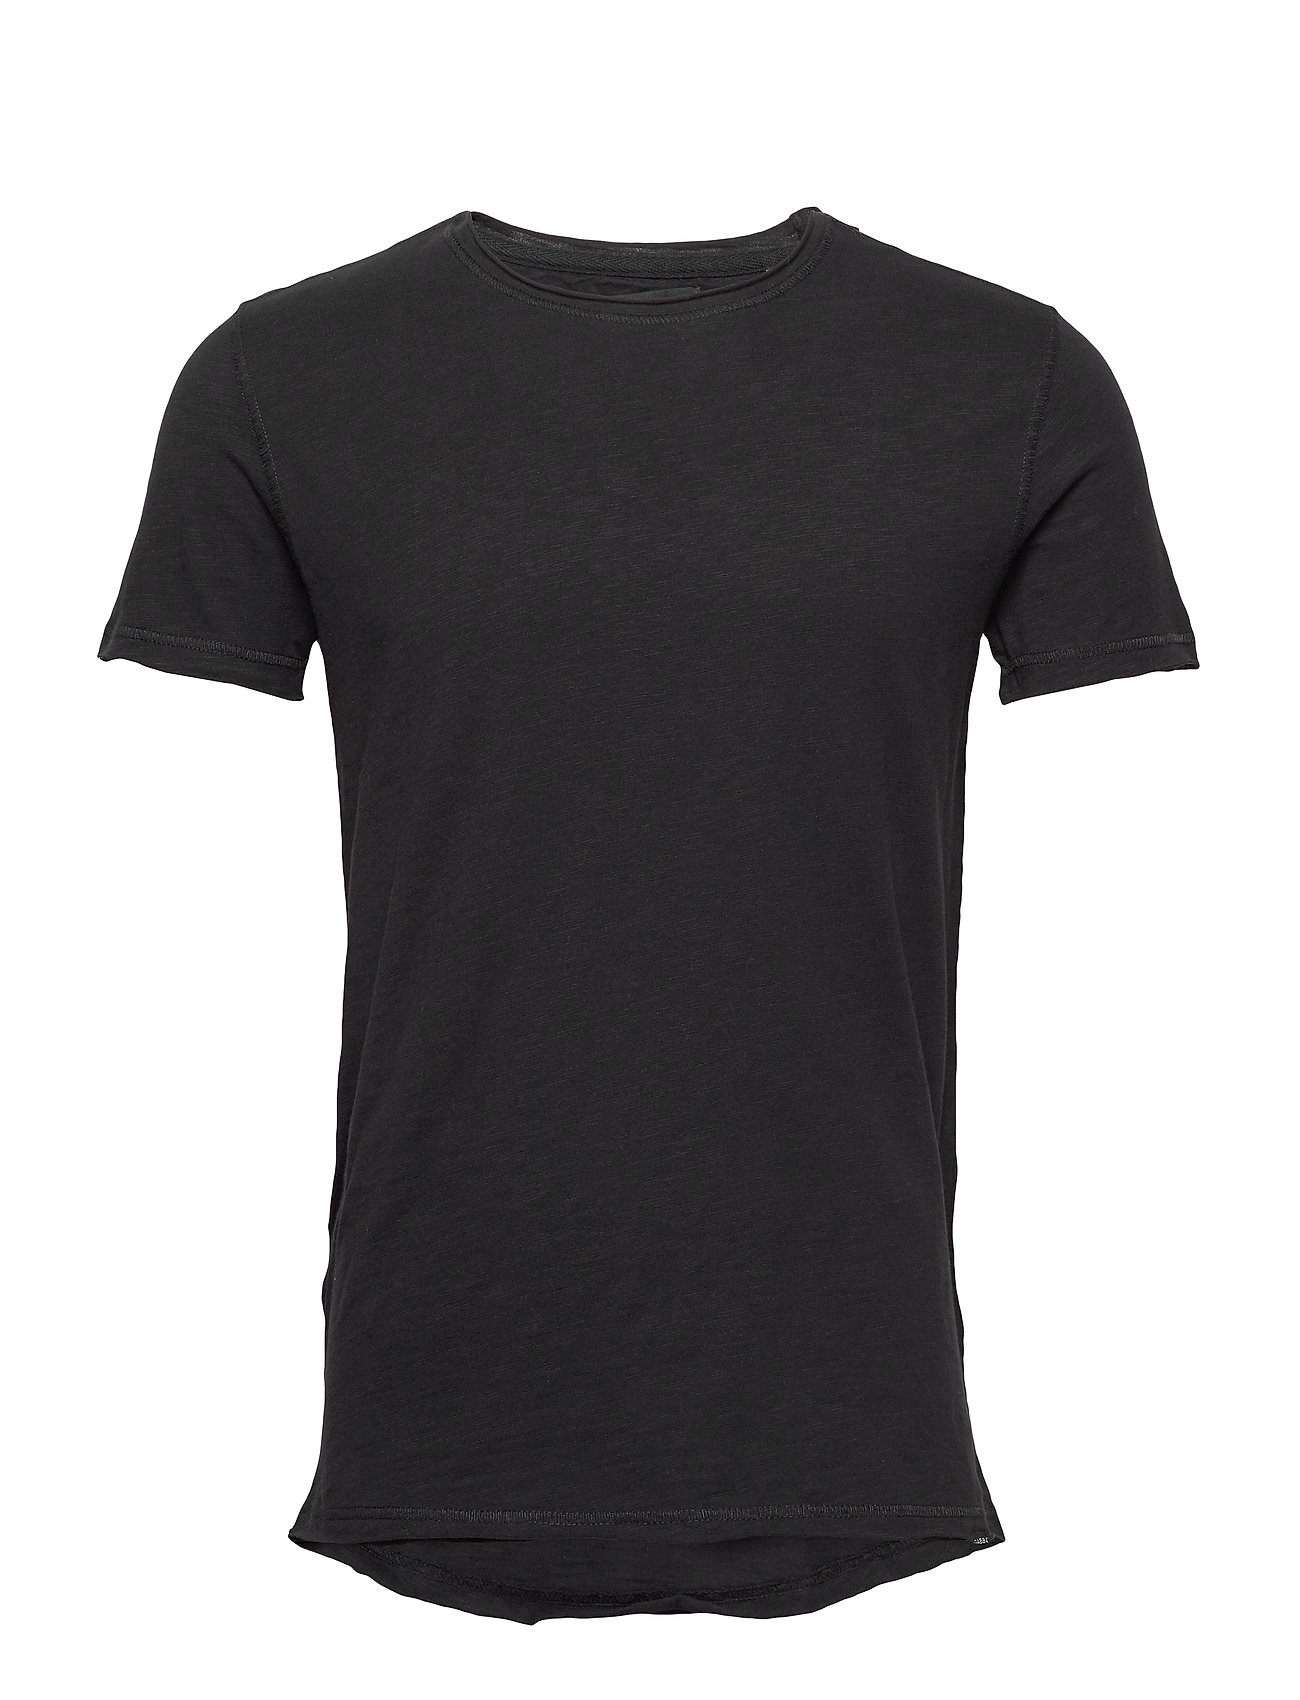 Image of Konrad Slub S/S Tee T-shirt Sort Gabba (3434805615)